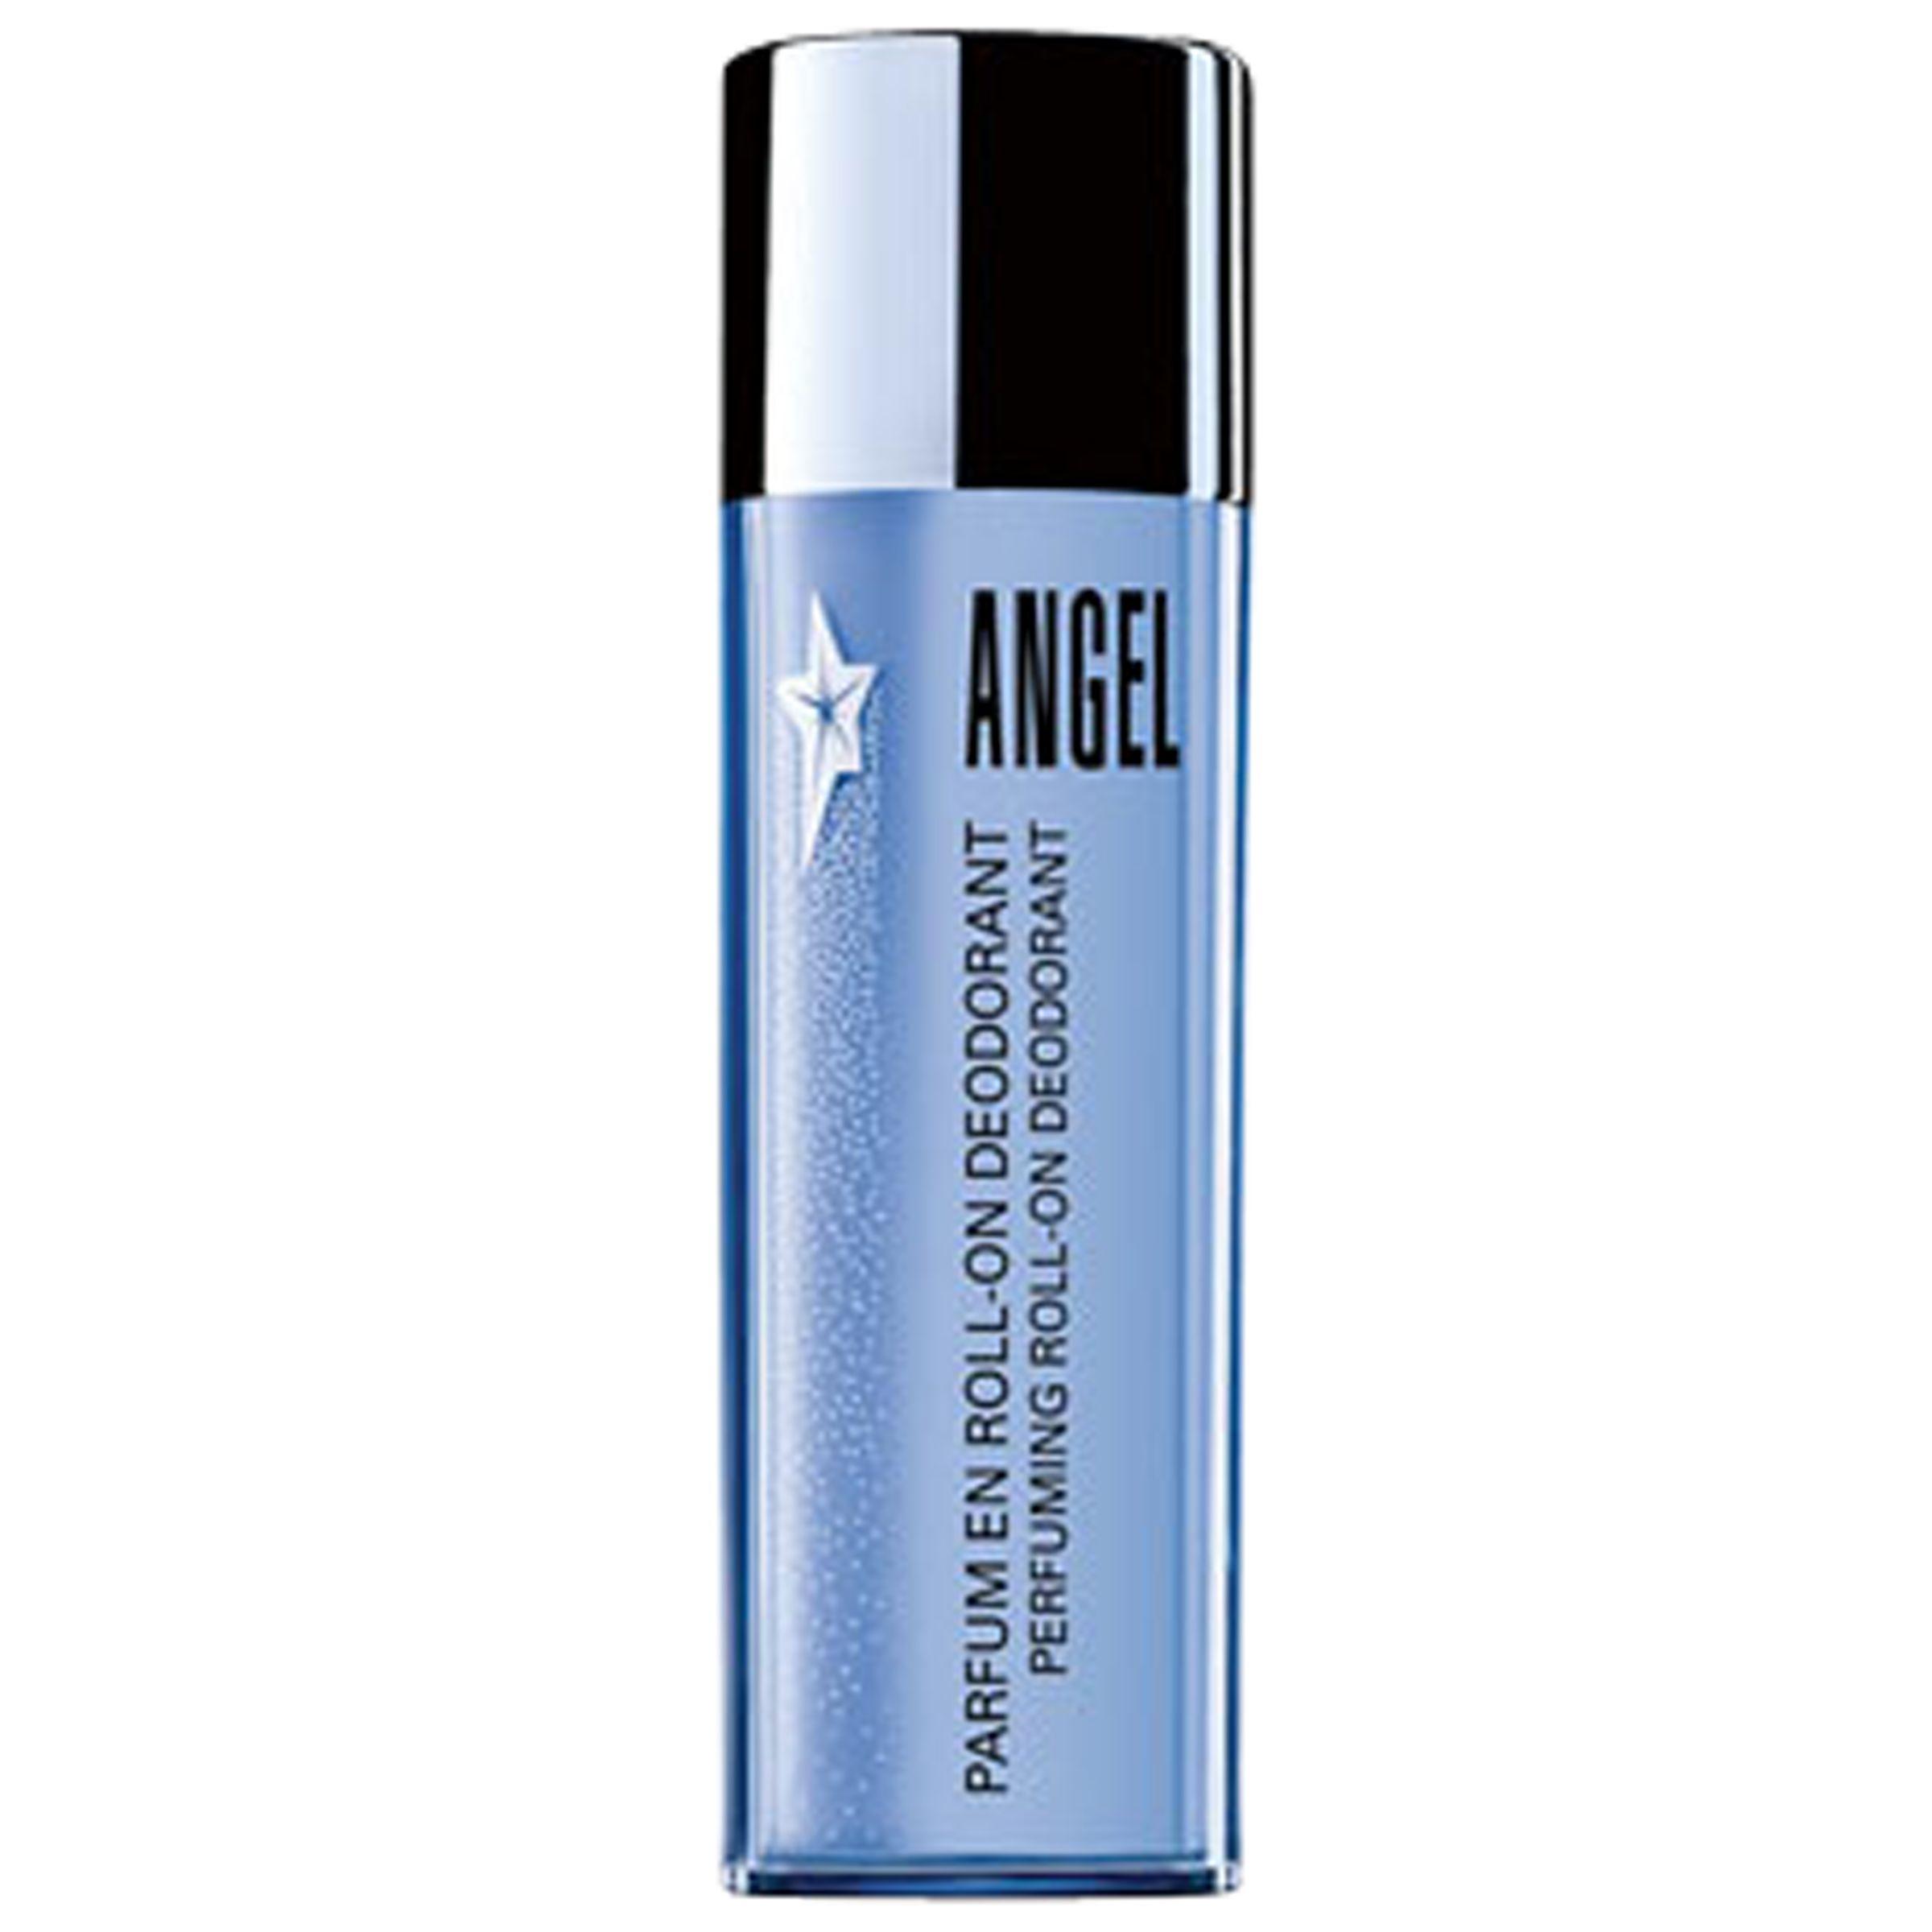 Mugler Mugler Angel Perfuming Deodorant Roll On, 50ml